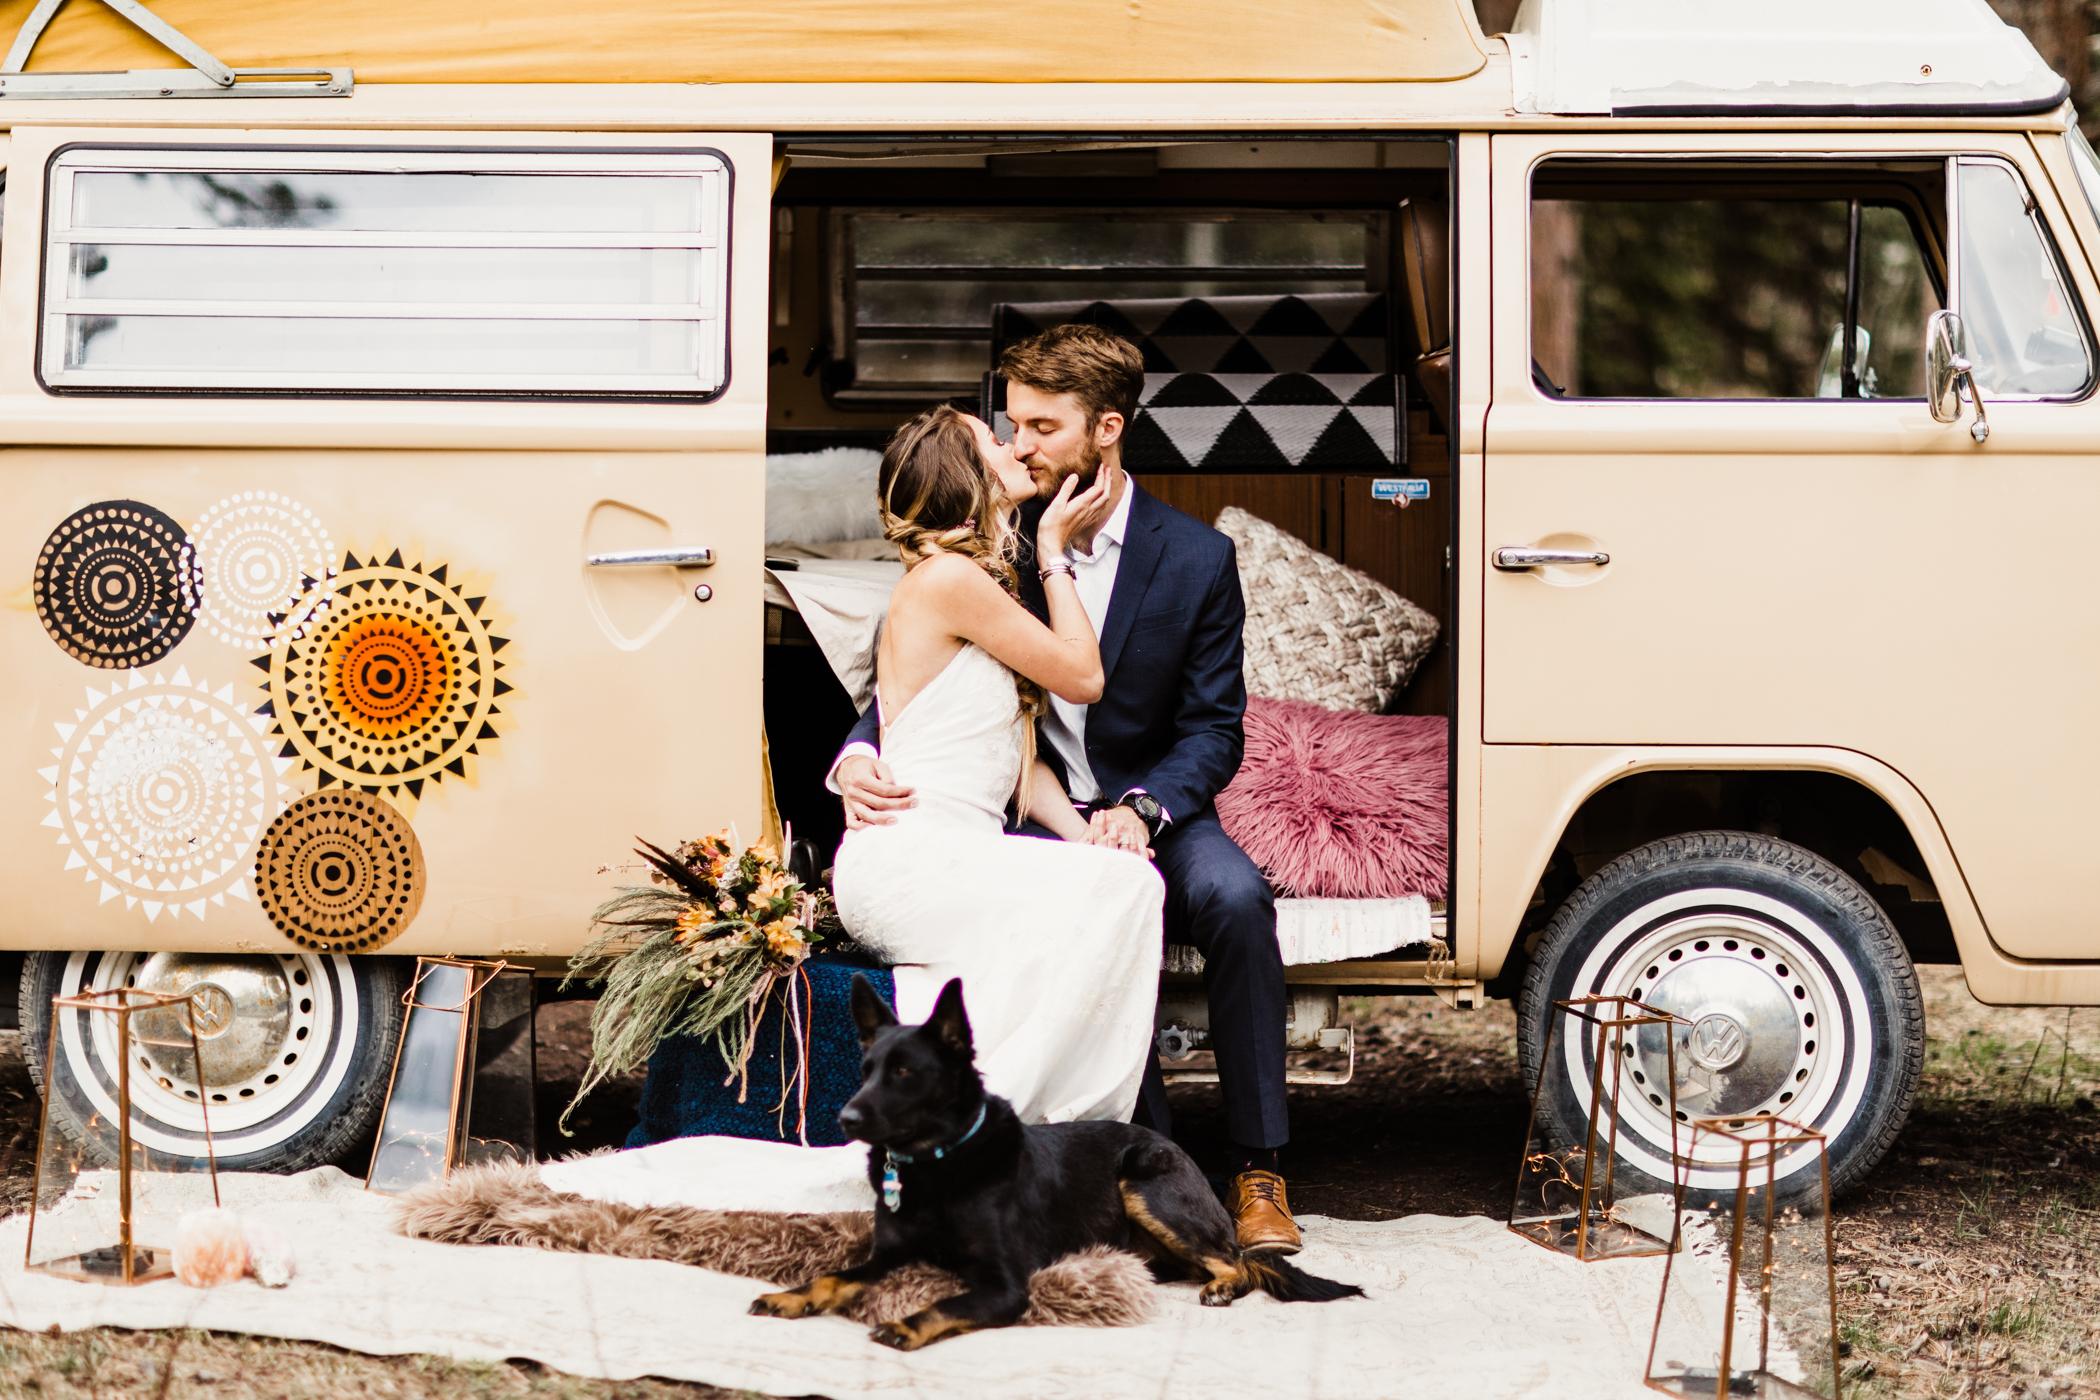 Sheena_Shahangian_Photography_Rocky_Mountain_Nederland_Colorado_Camper_Van_Adventure_Elopement_Rayne_Michael-3.jpg